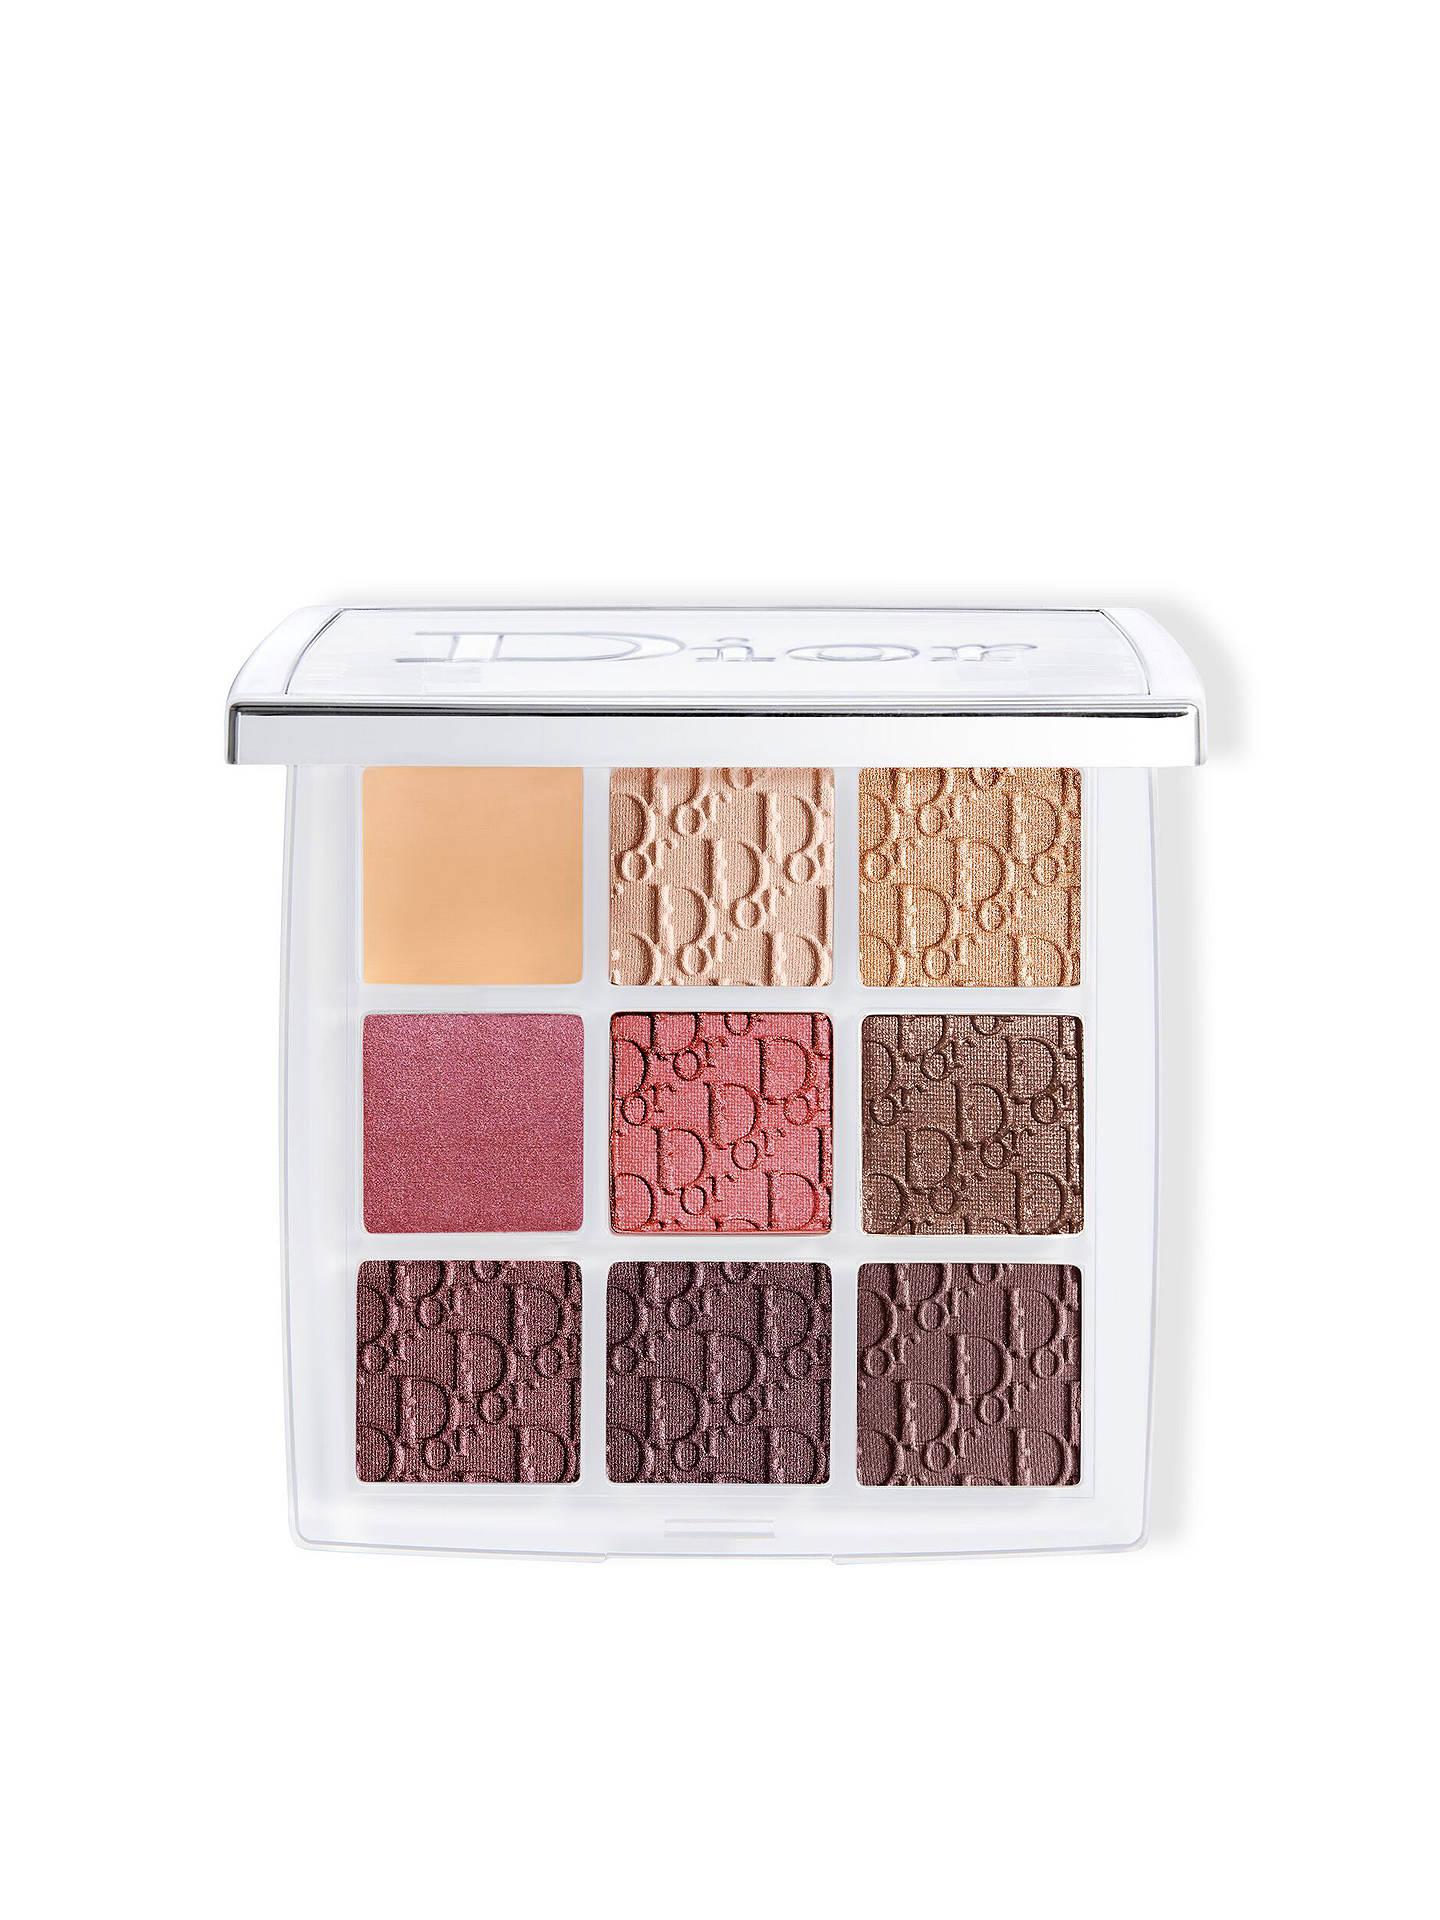 Buy Dior Backstage Eye Palette, 004 Rosewood Neutrals Online at johnlewis.com